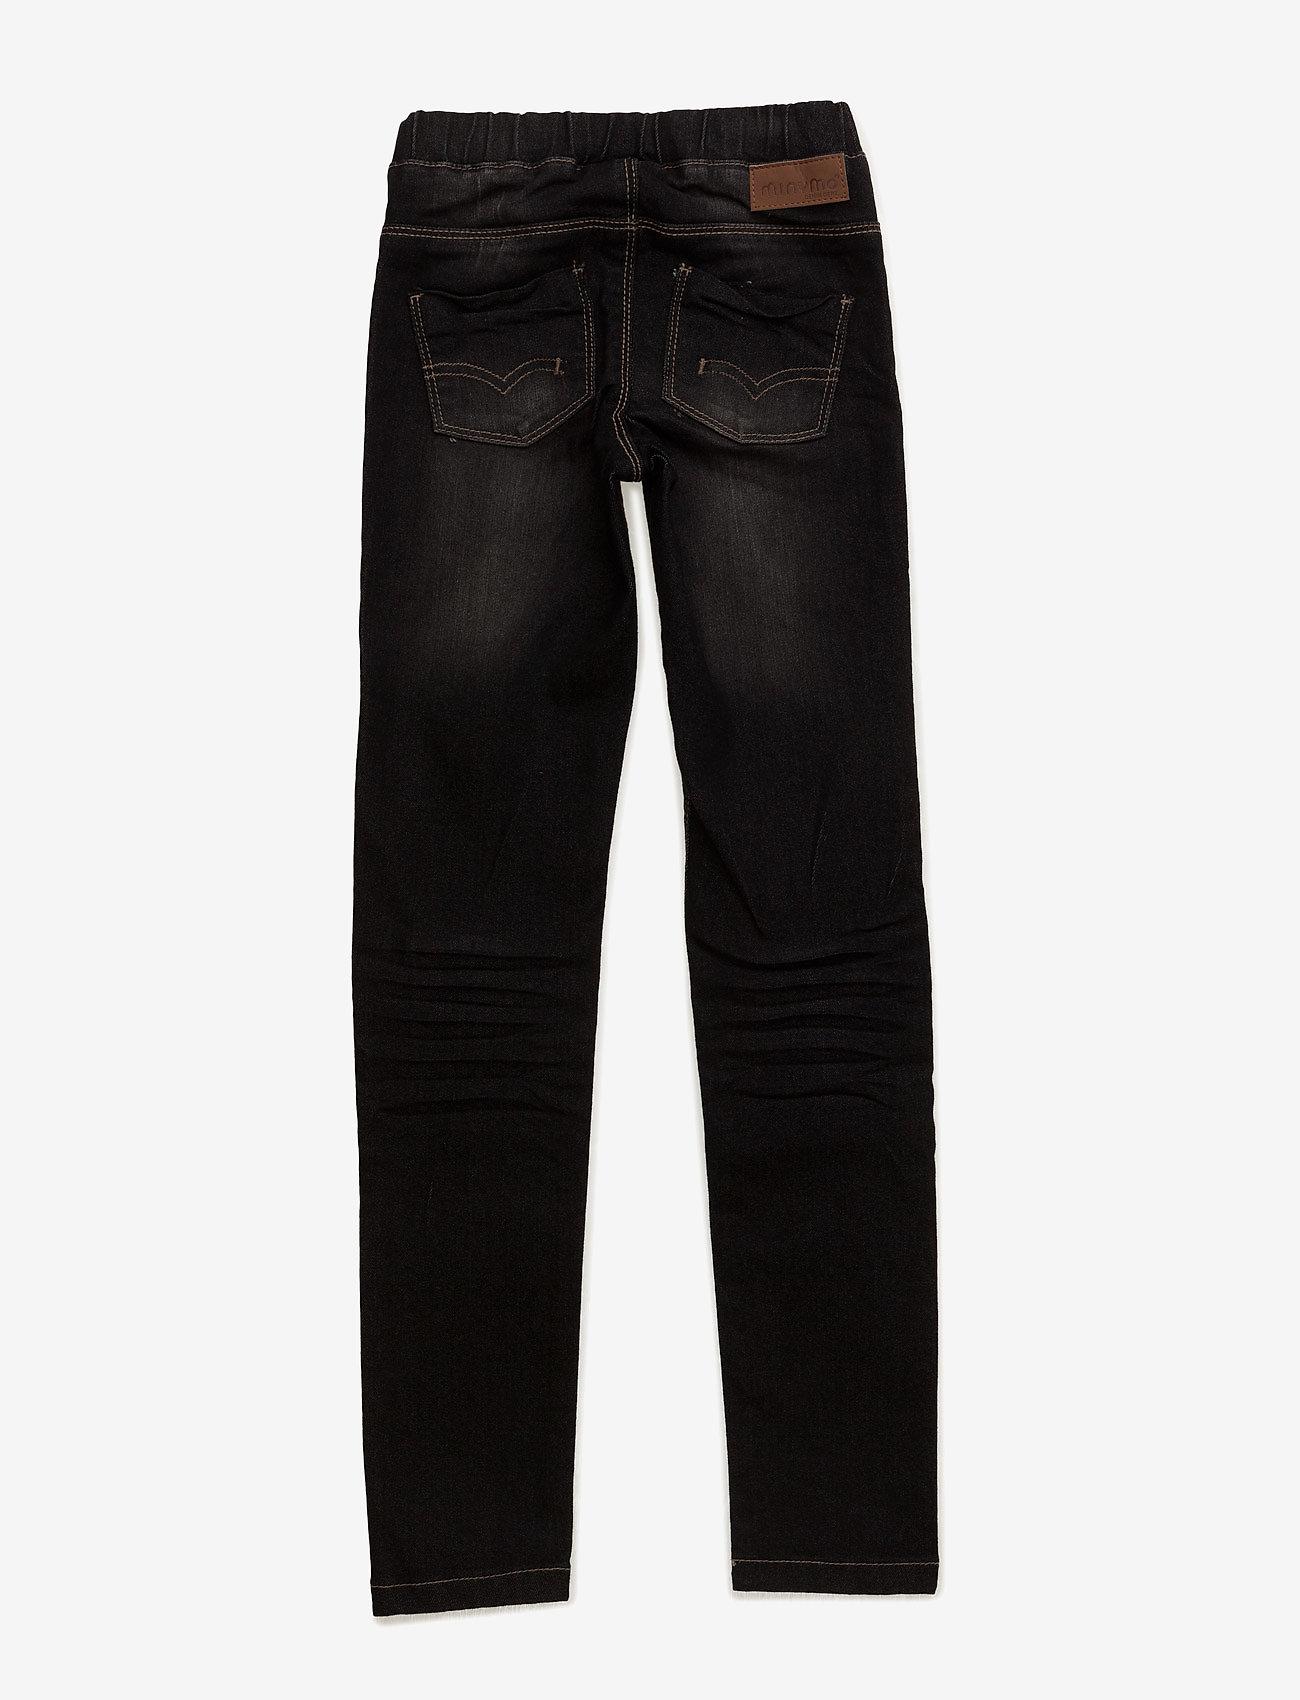 Minymo - Jeans girl - Slim fit - jeans - black - 1